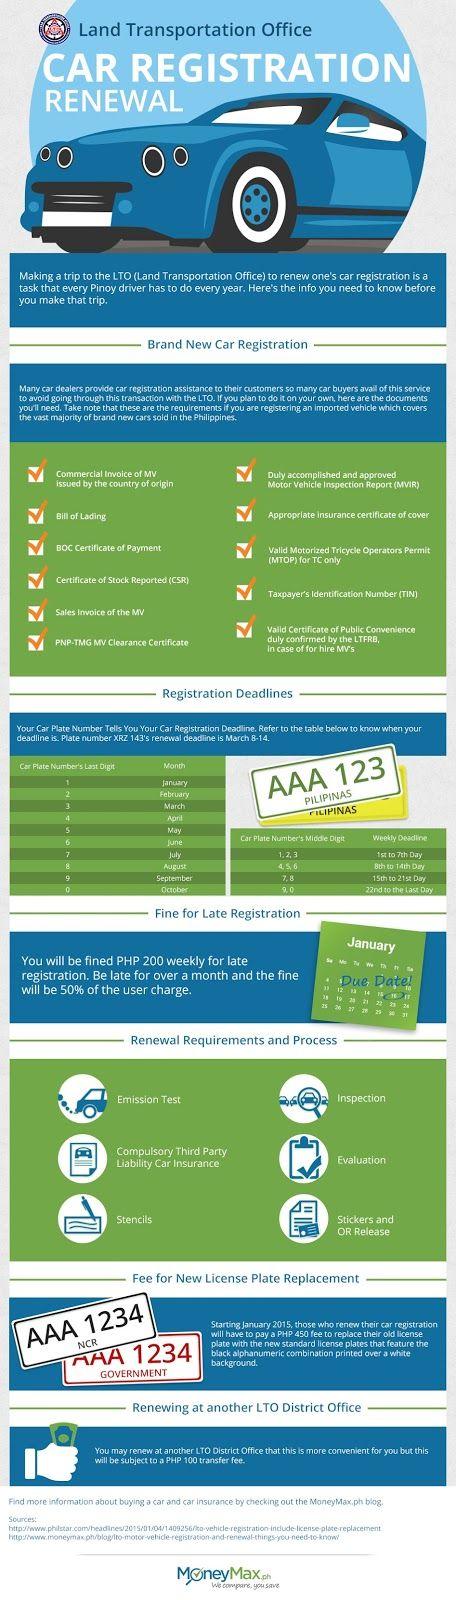 Land Transportation Office (LTO) Philippine Car Registration Renewal: INFOGRAPHIC Guide.